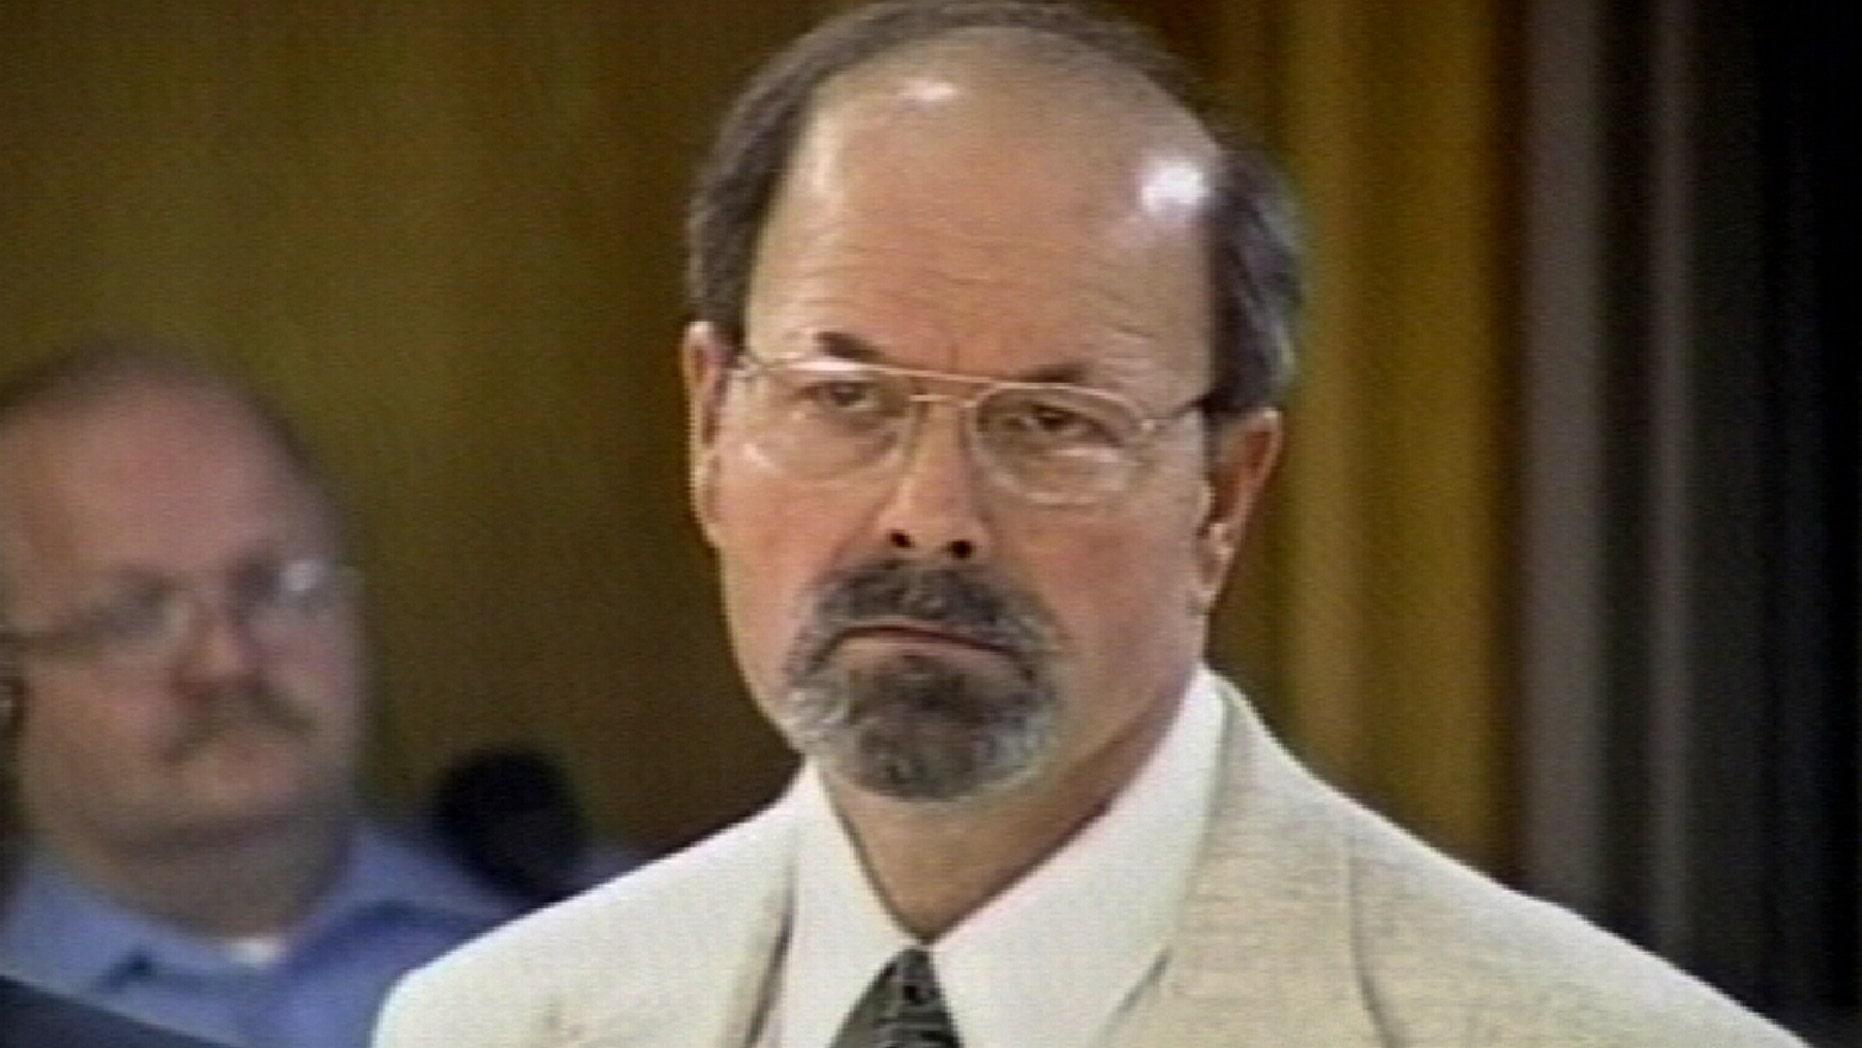 BTK killer Dennis Rader is the subject of a new documentary on Oxygen.